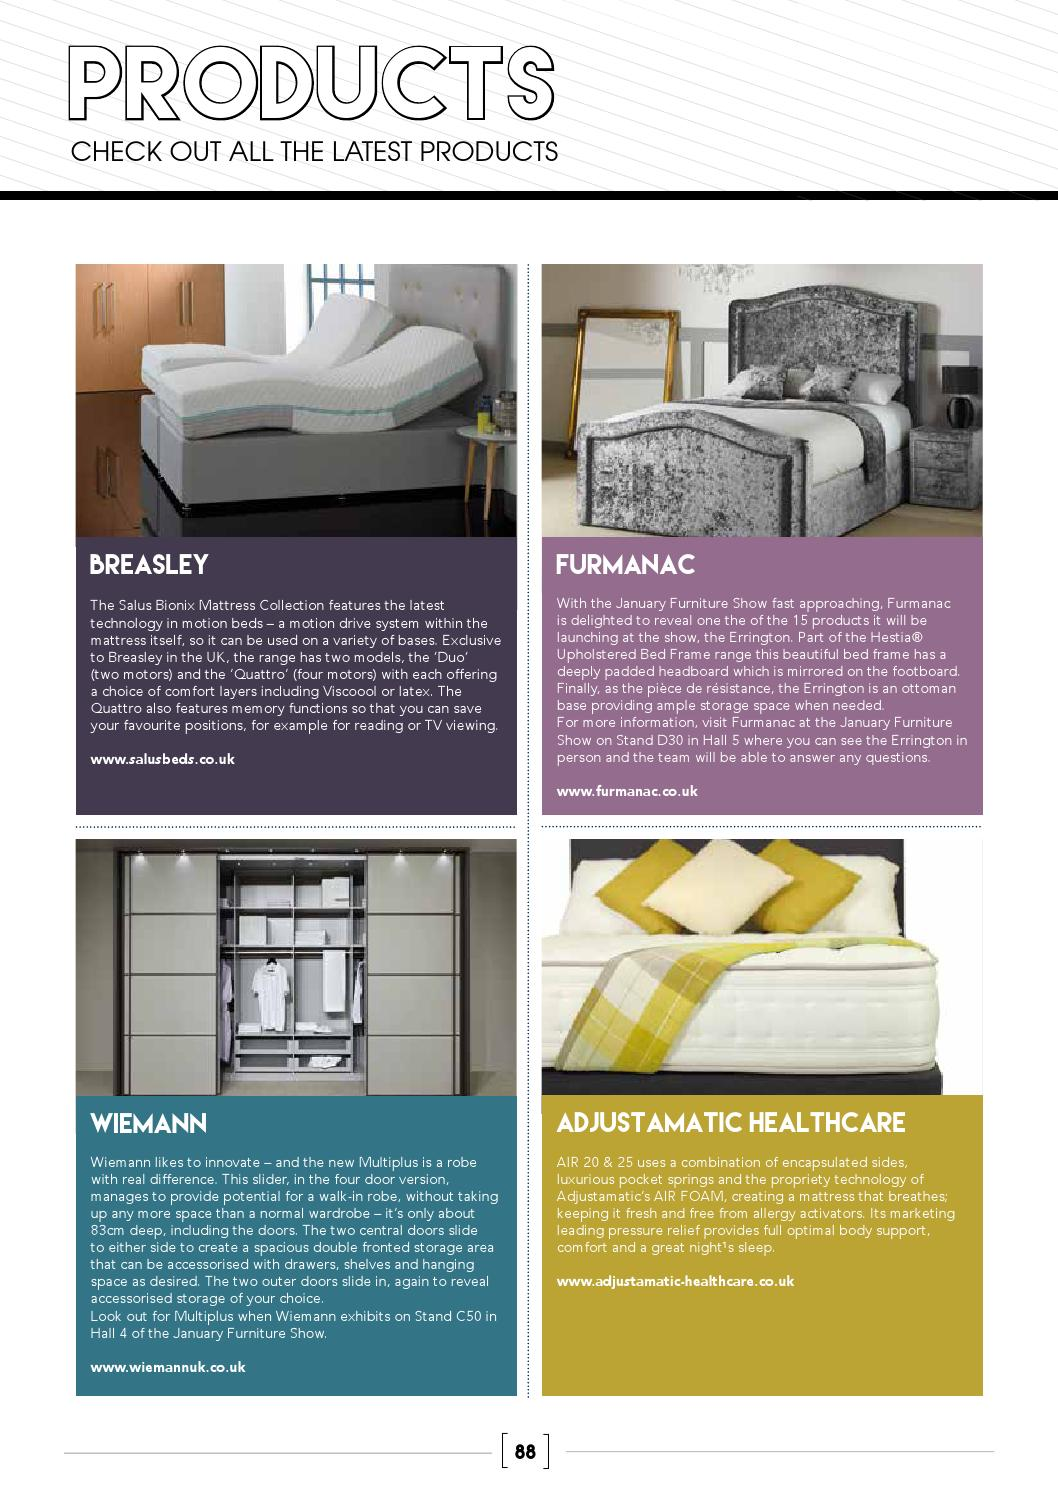 Astounding Beds Magazine January 2016 By Cabinet Maker Issuu Beatyapartments Chair Design Images Beatyapartmentscom